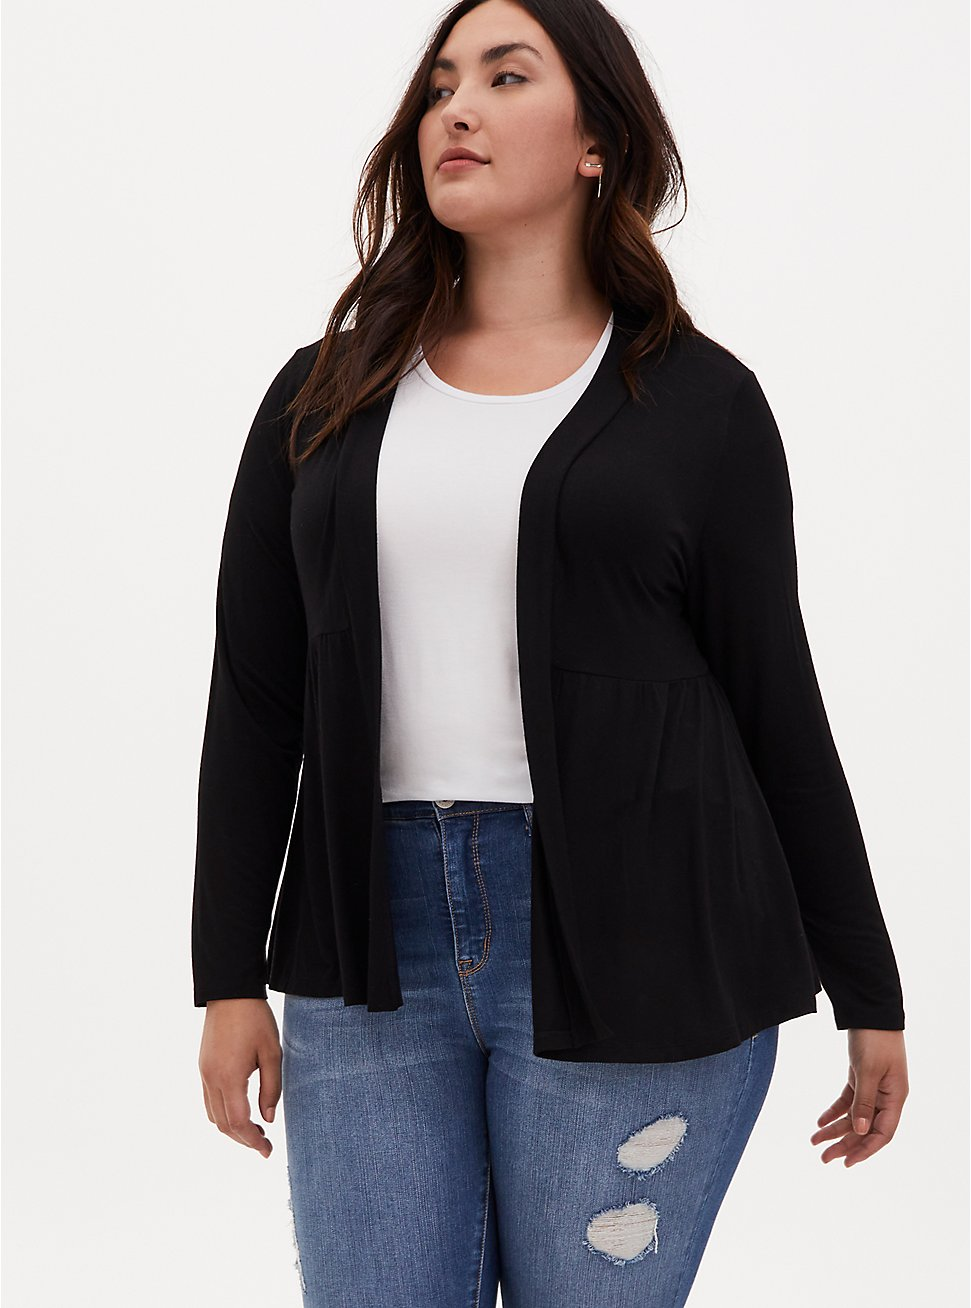 Super Soft Black Open Front Peplum Cardigan, DEEP BLACK, hi-res